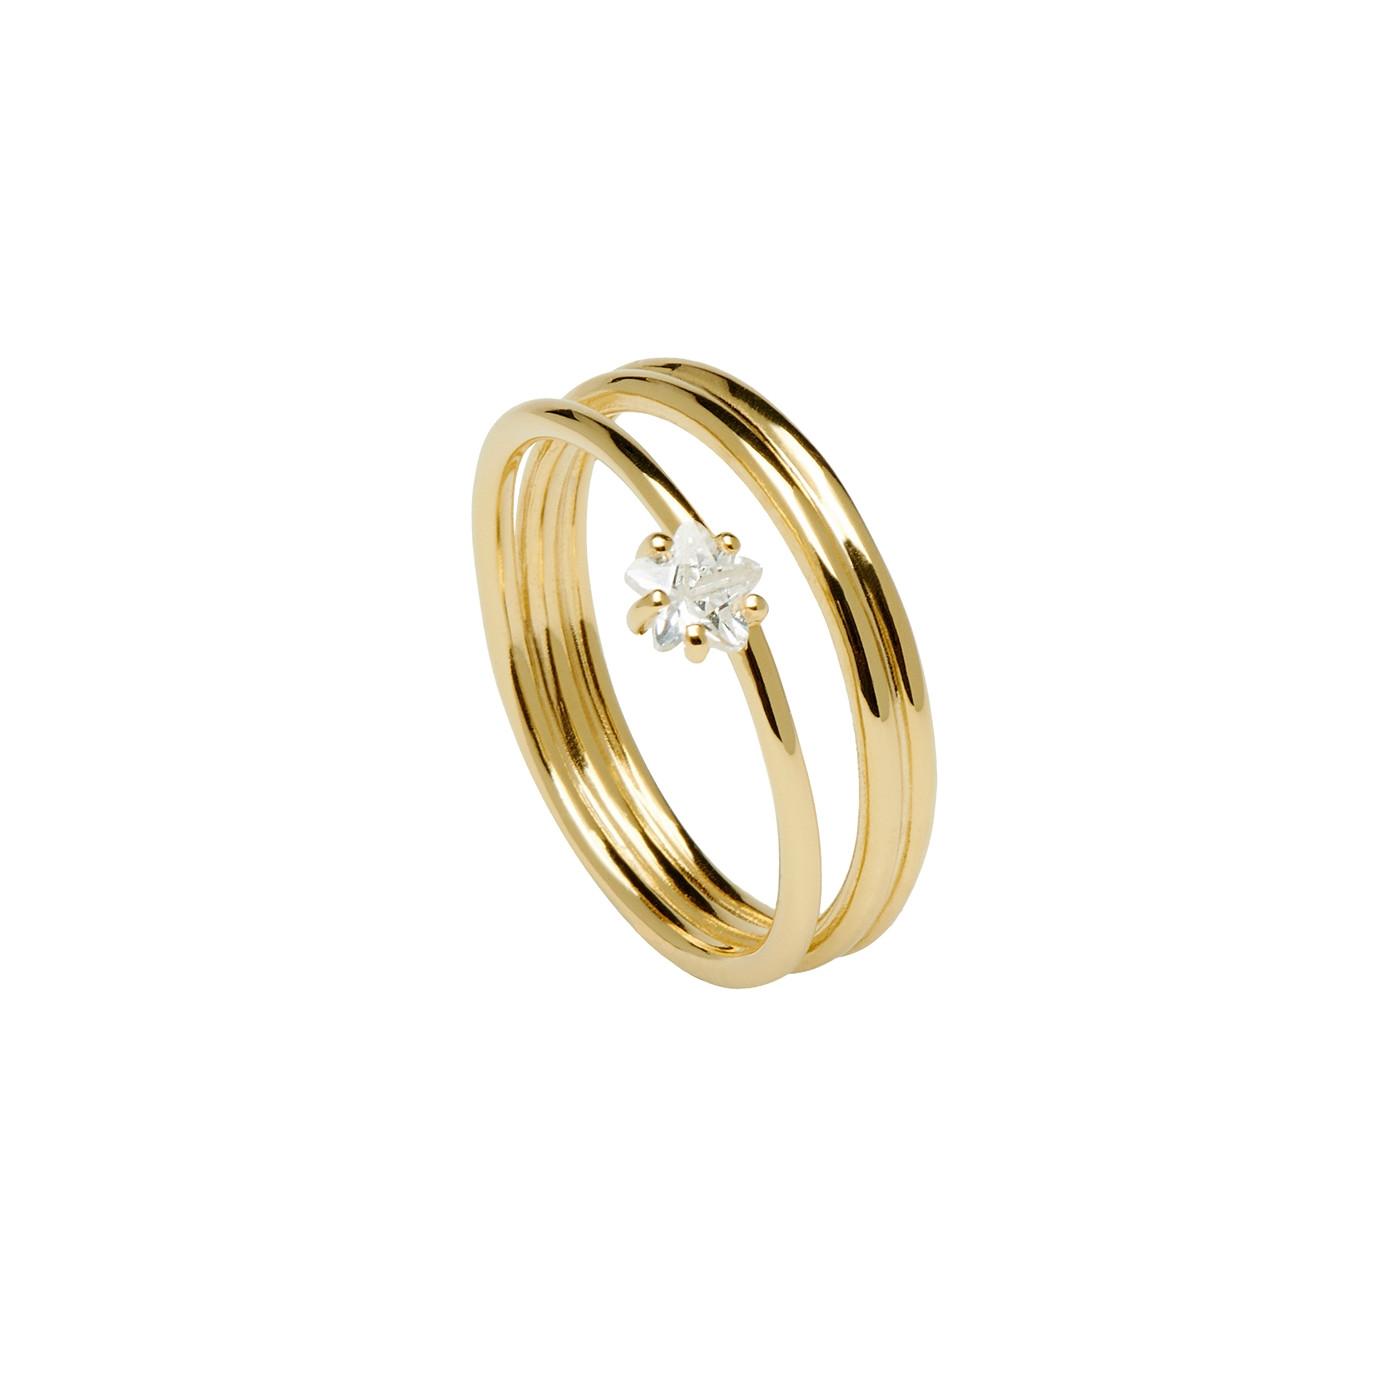 P D Paola 925 Sterling Zilveren Goudkleurige Glow Ring AN01-098